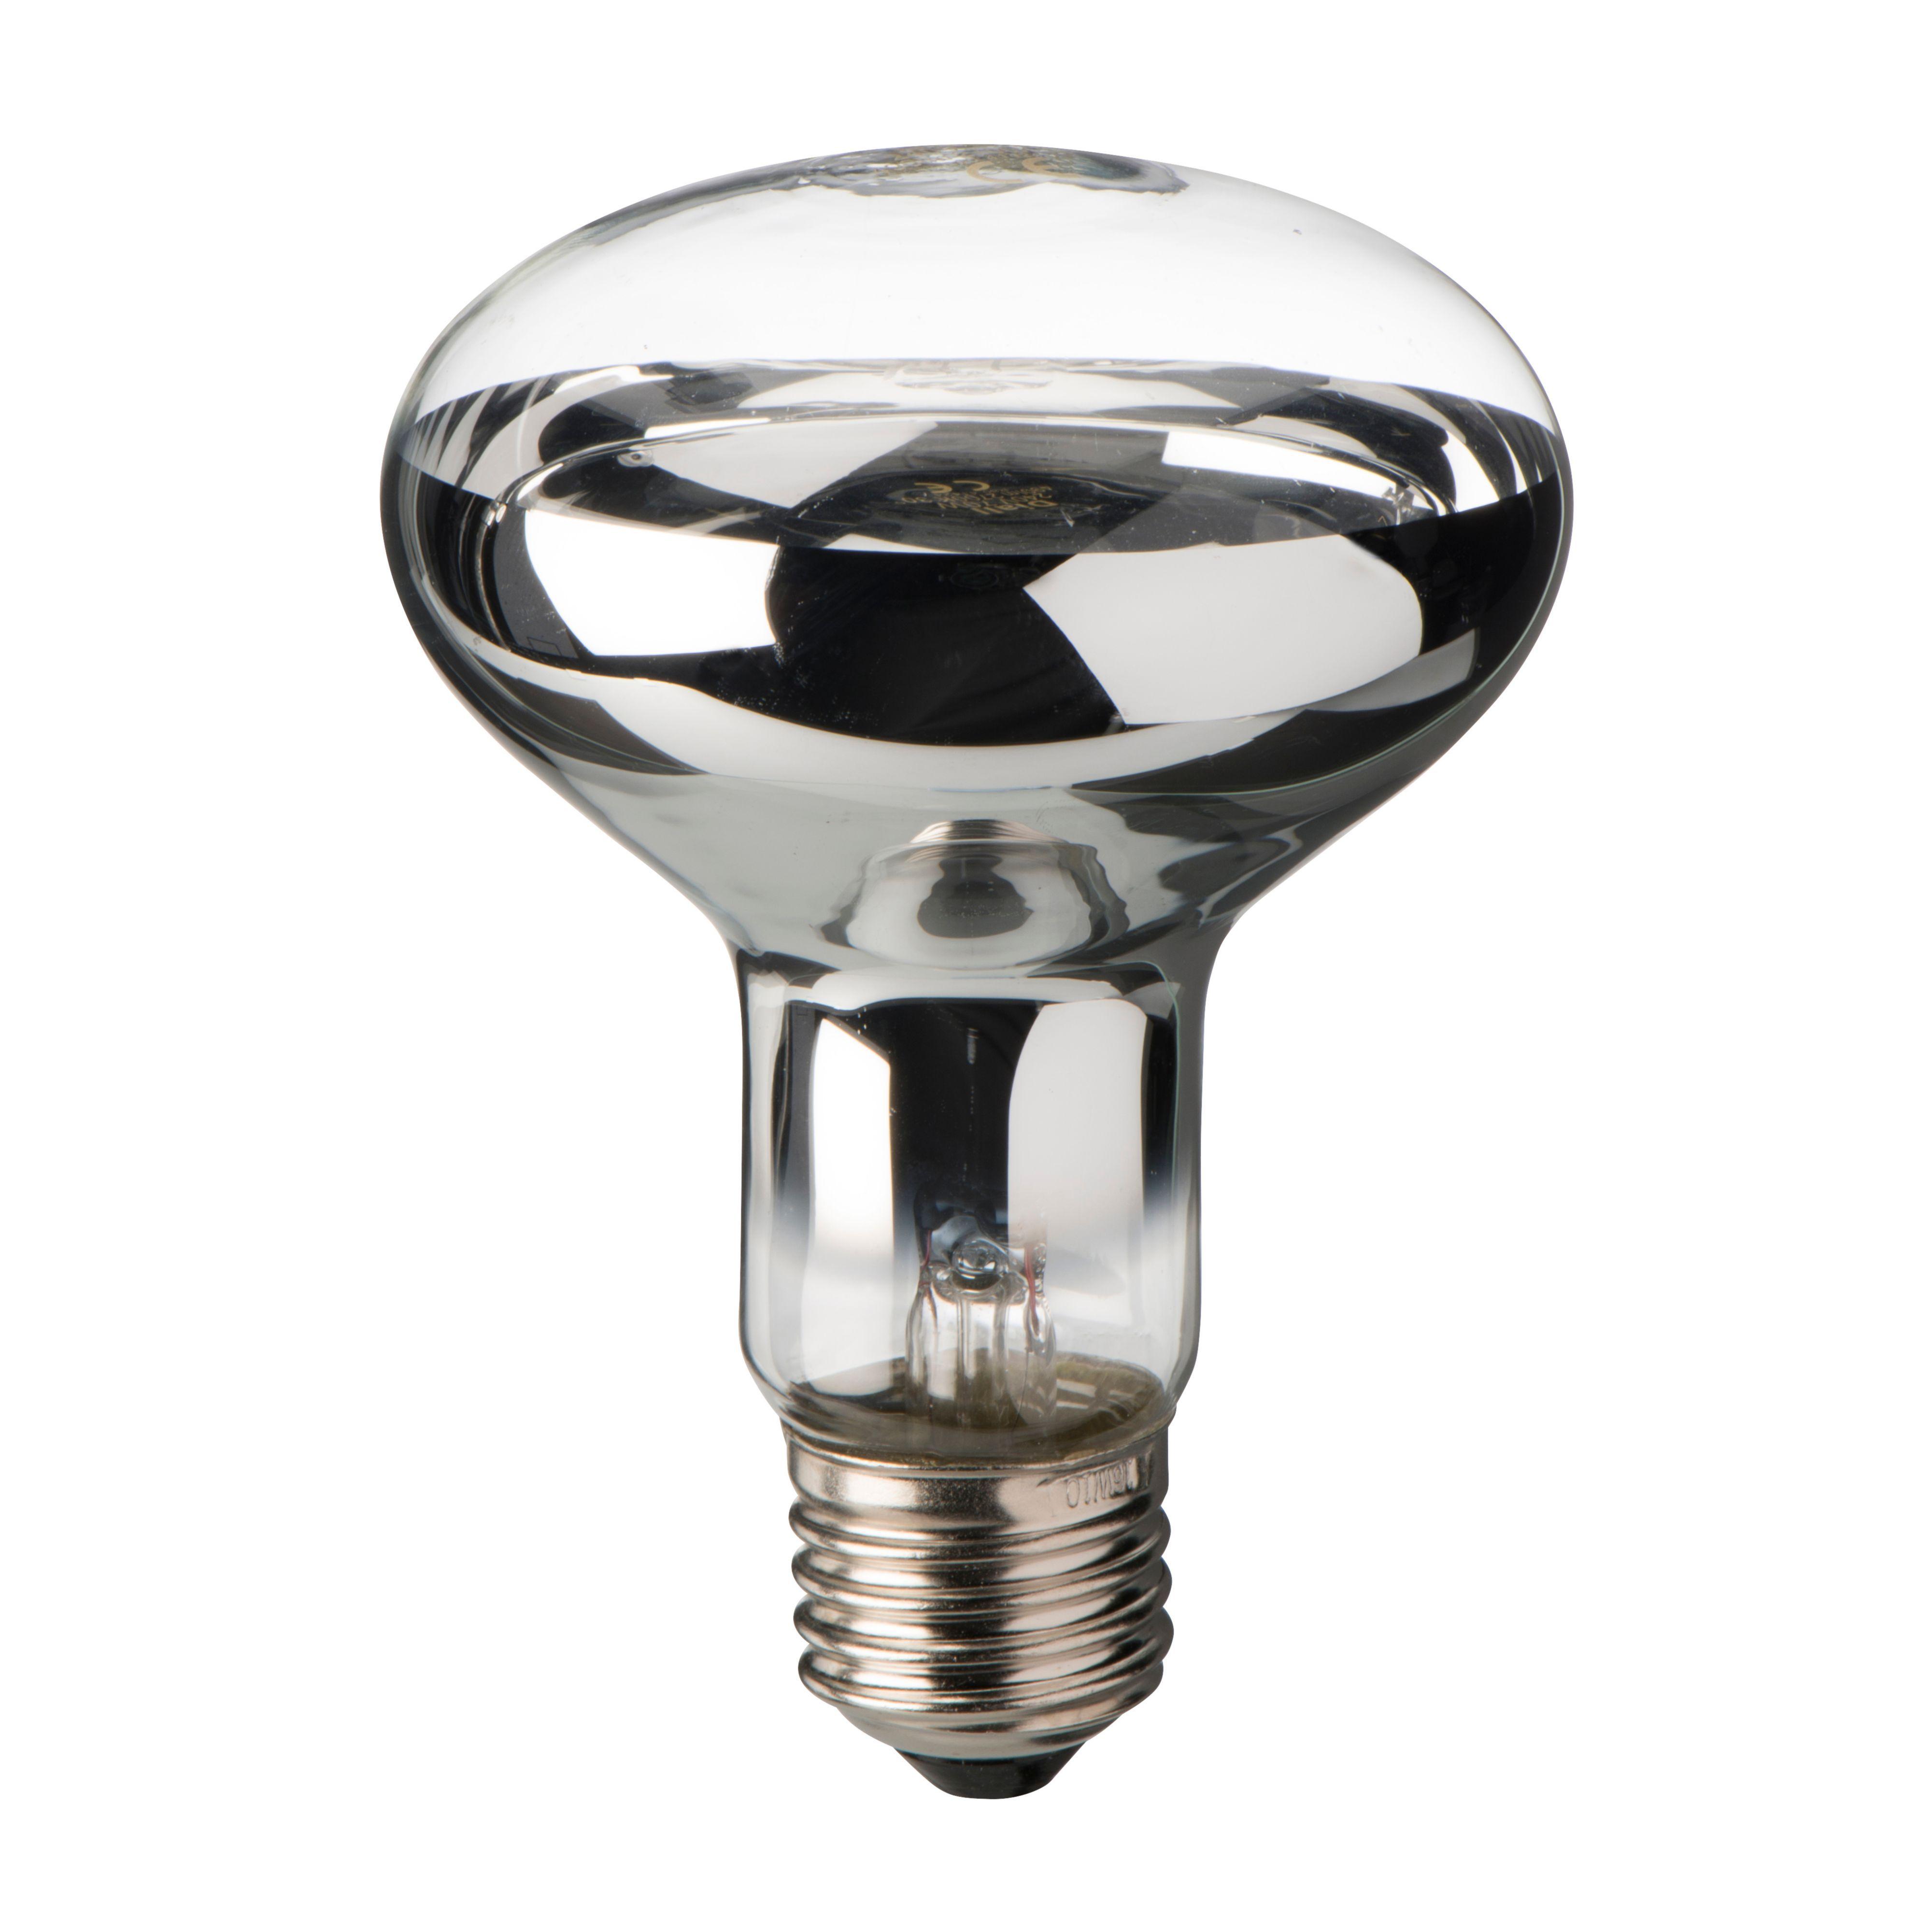 Diall E27 70w Halogen Dimmable R80 Light Bulb